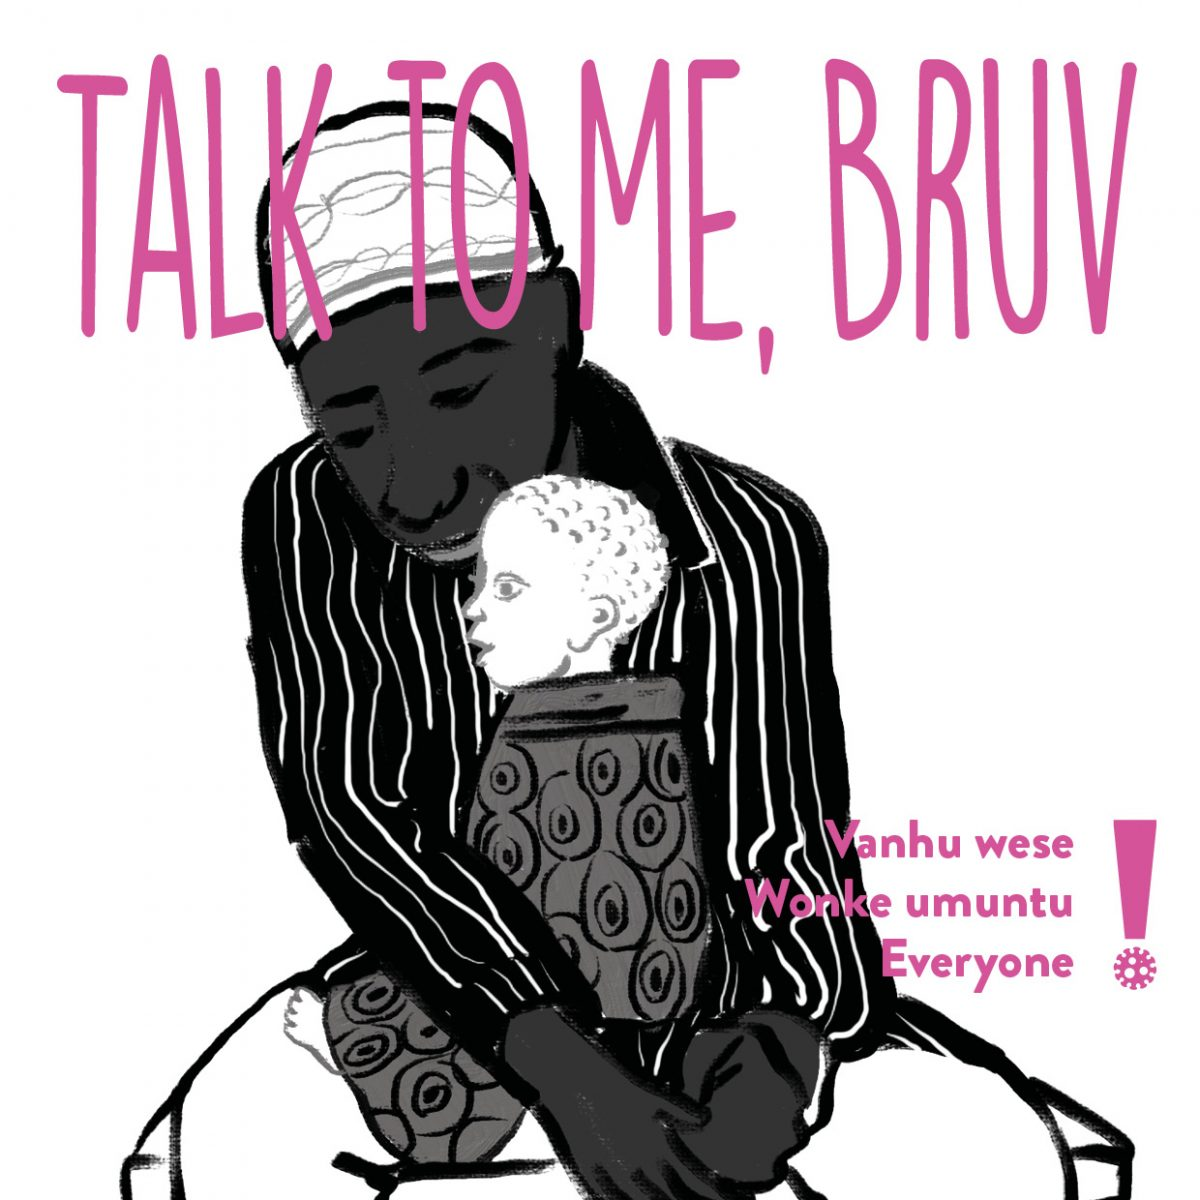 Talk-to-me-covid